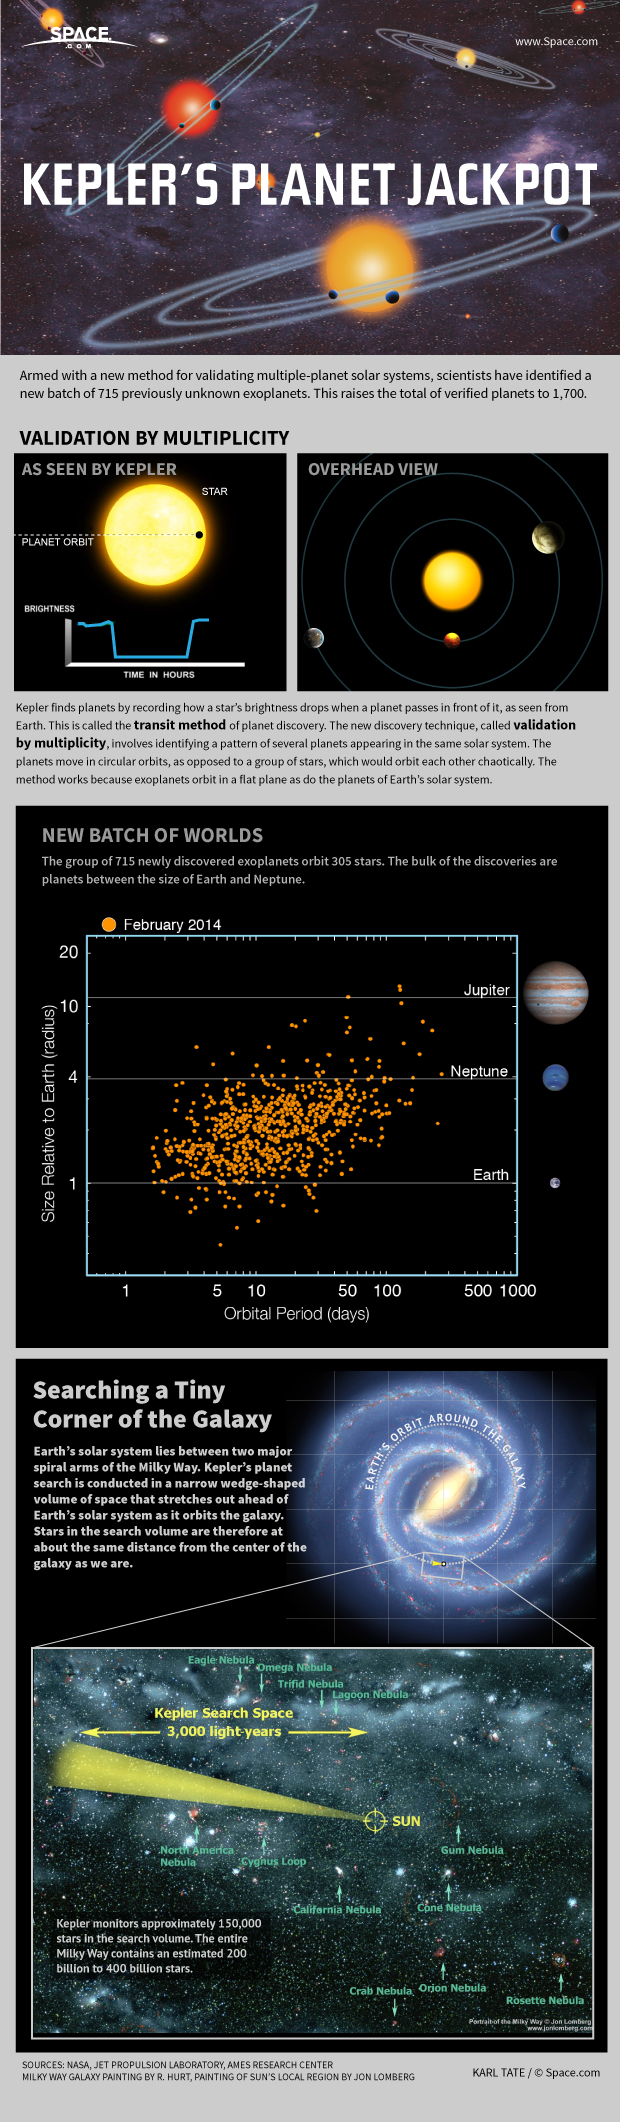 Kepler Space Telescope's Exoplanet Bonanza Explained (Infographic)